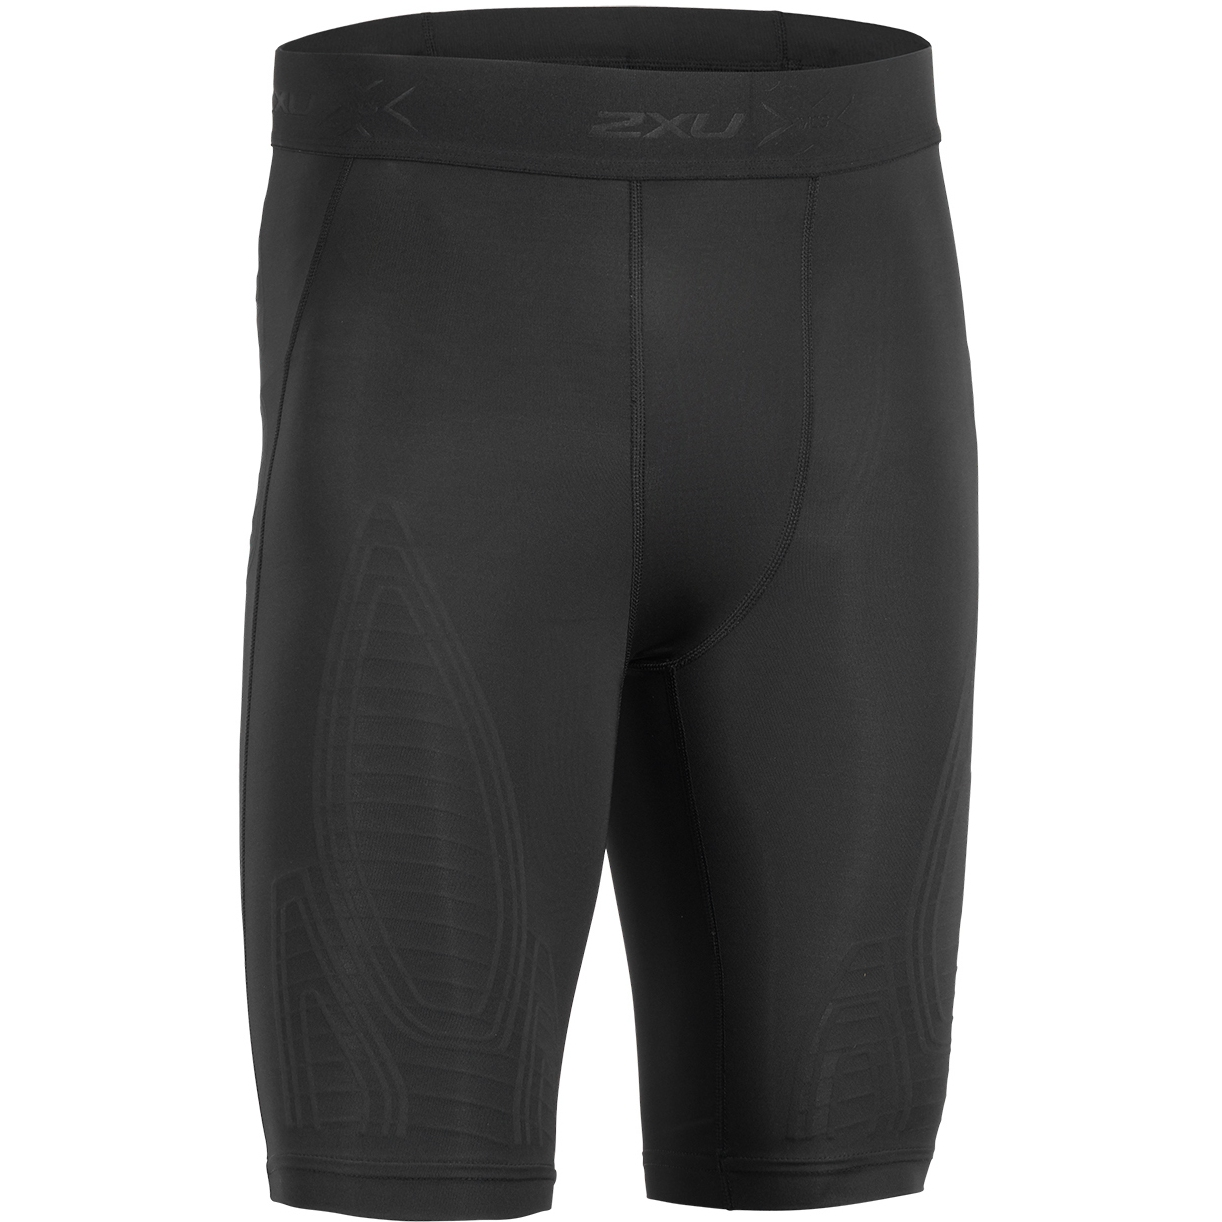 Imagen de 2XU MCS Cross Training Compression Pantalon corto - black/gold